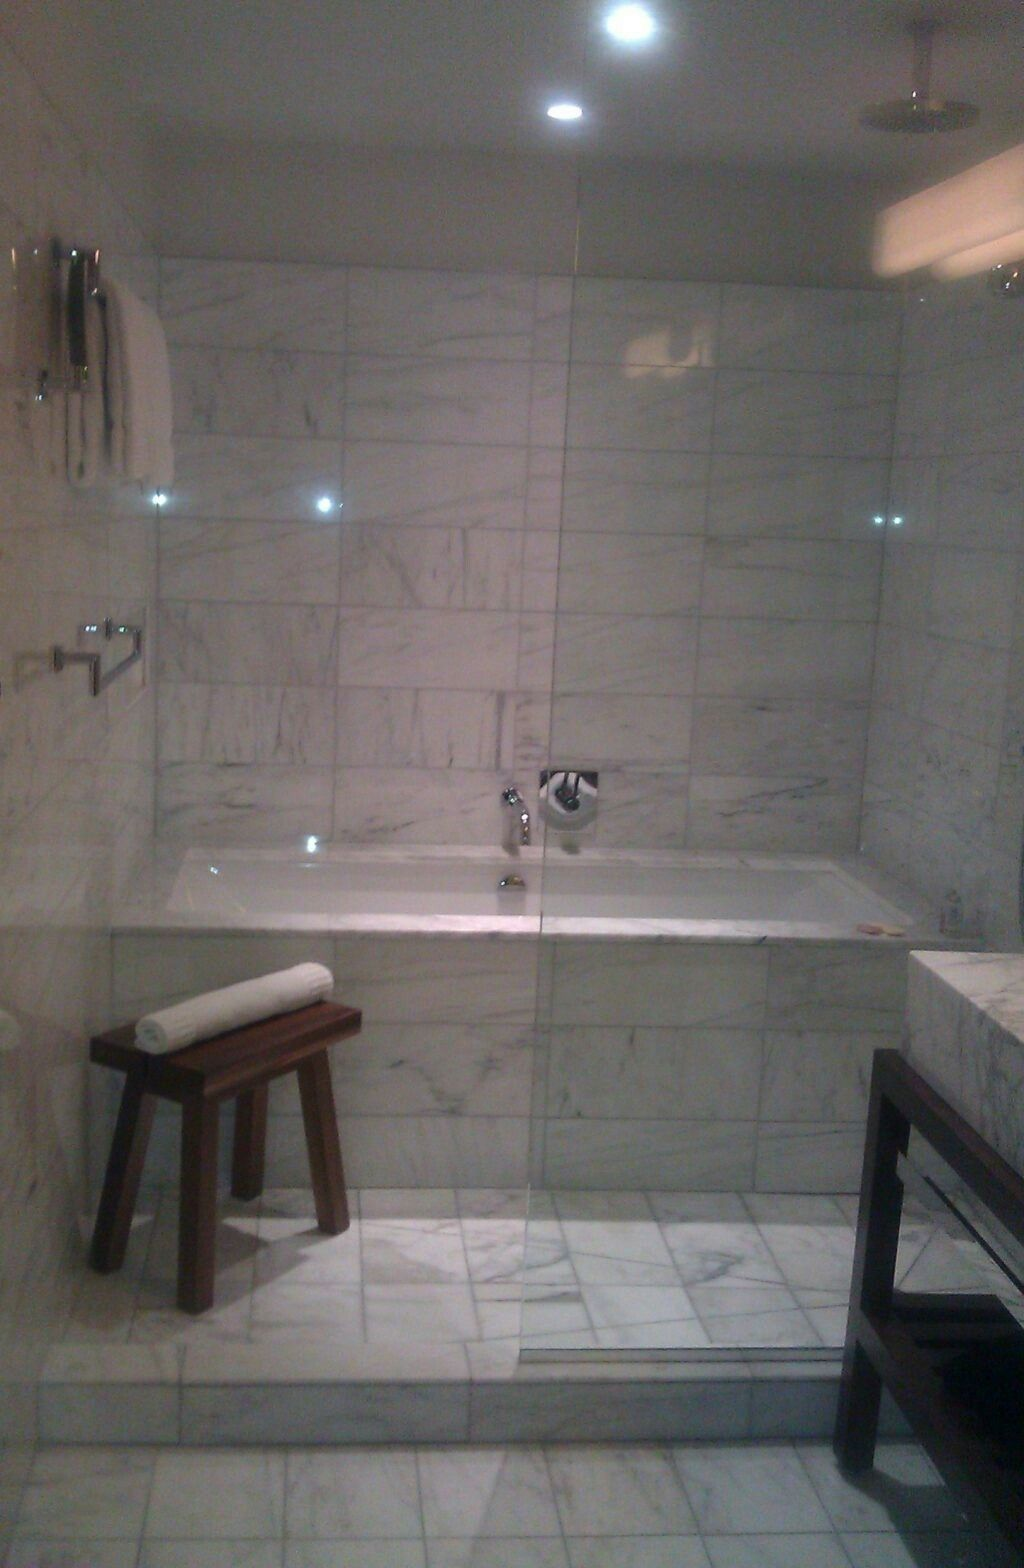 Pin By Julie Ludi On Bathrooms Pinterest Bathtub Shower